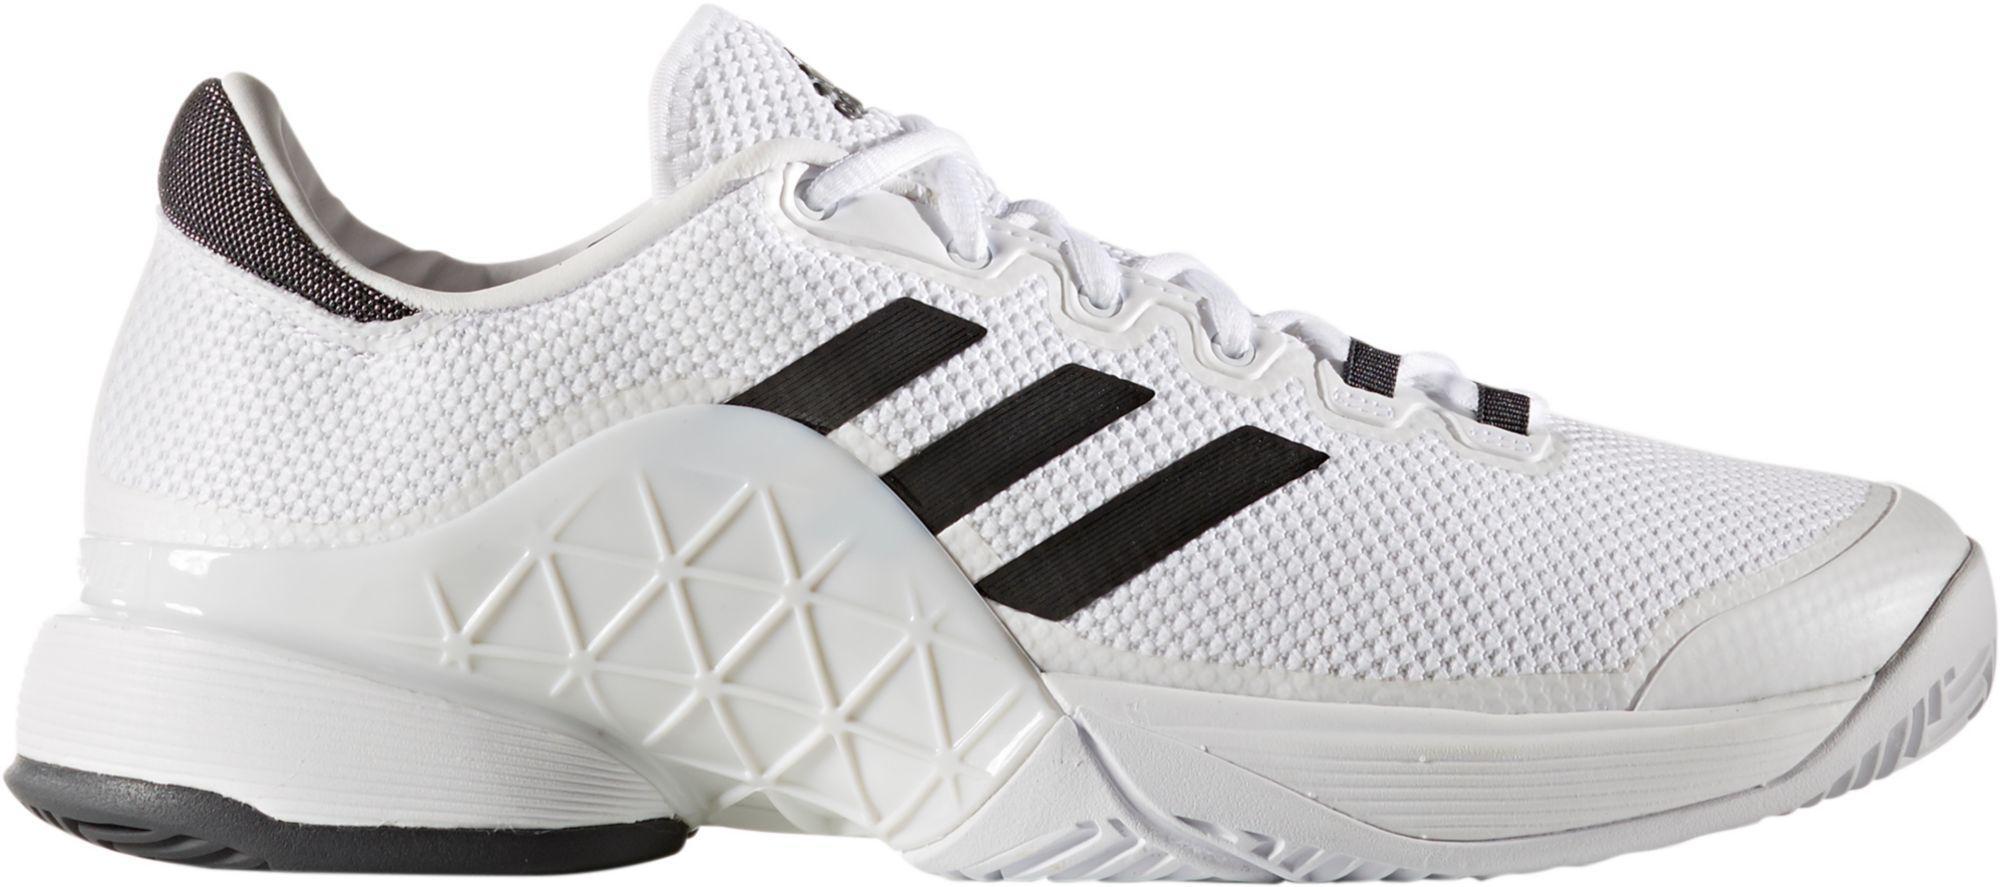 lyst adidas arricade 2017, scarpe da tennis per gli uomini.